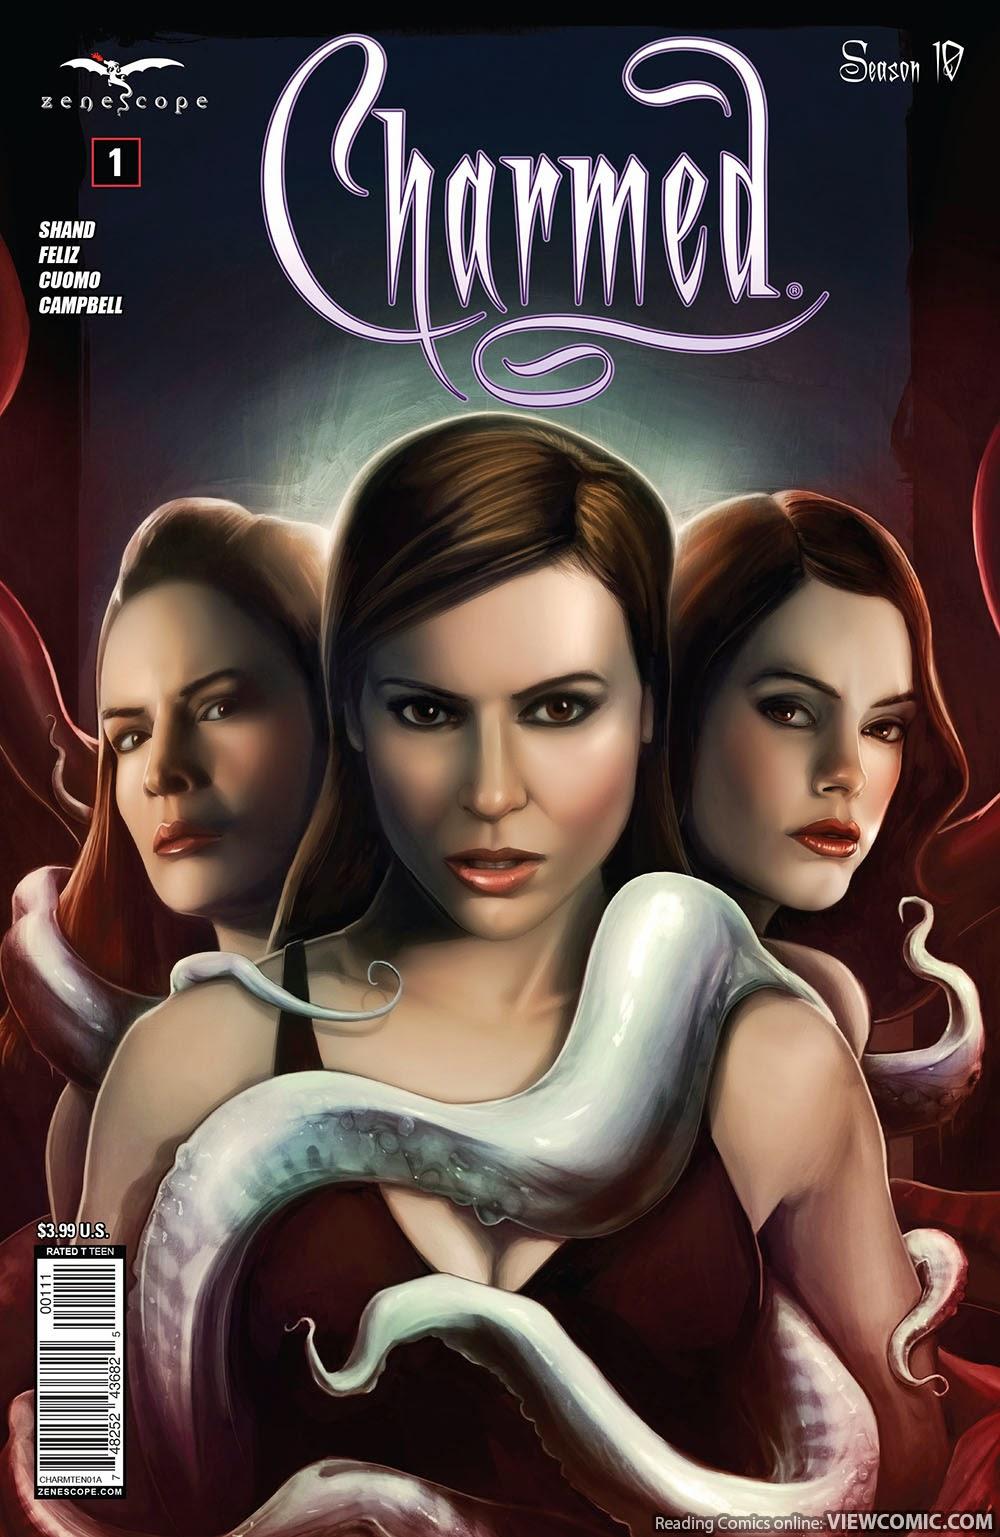 Charmed – Season 10 | Viewcomic reading comics online for